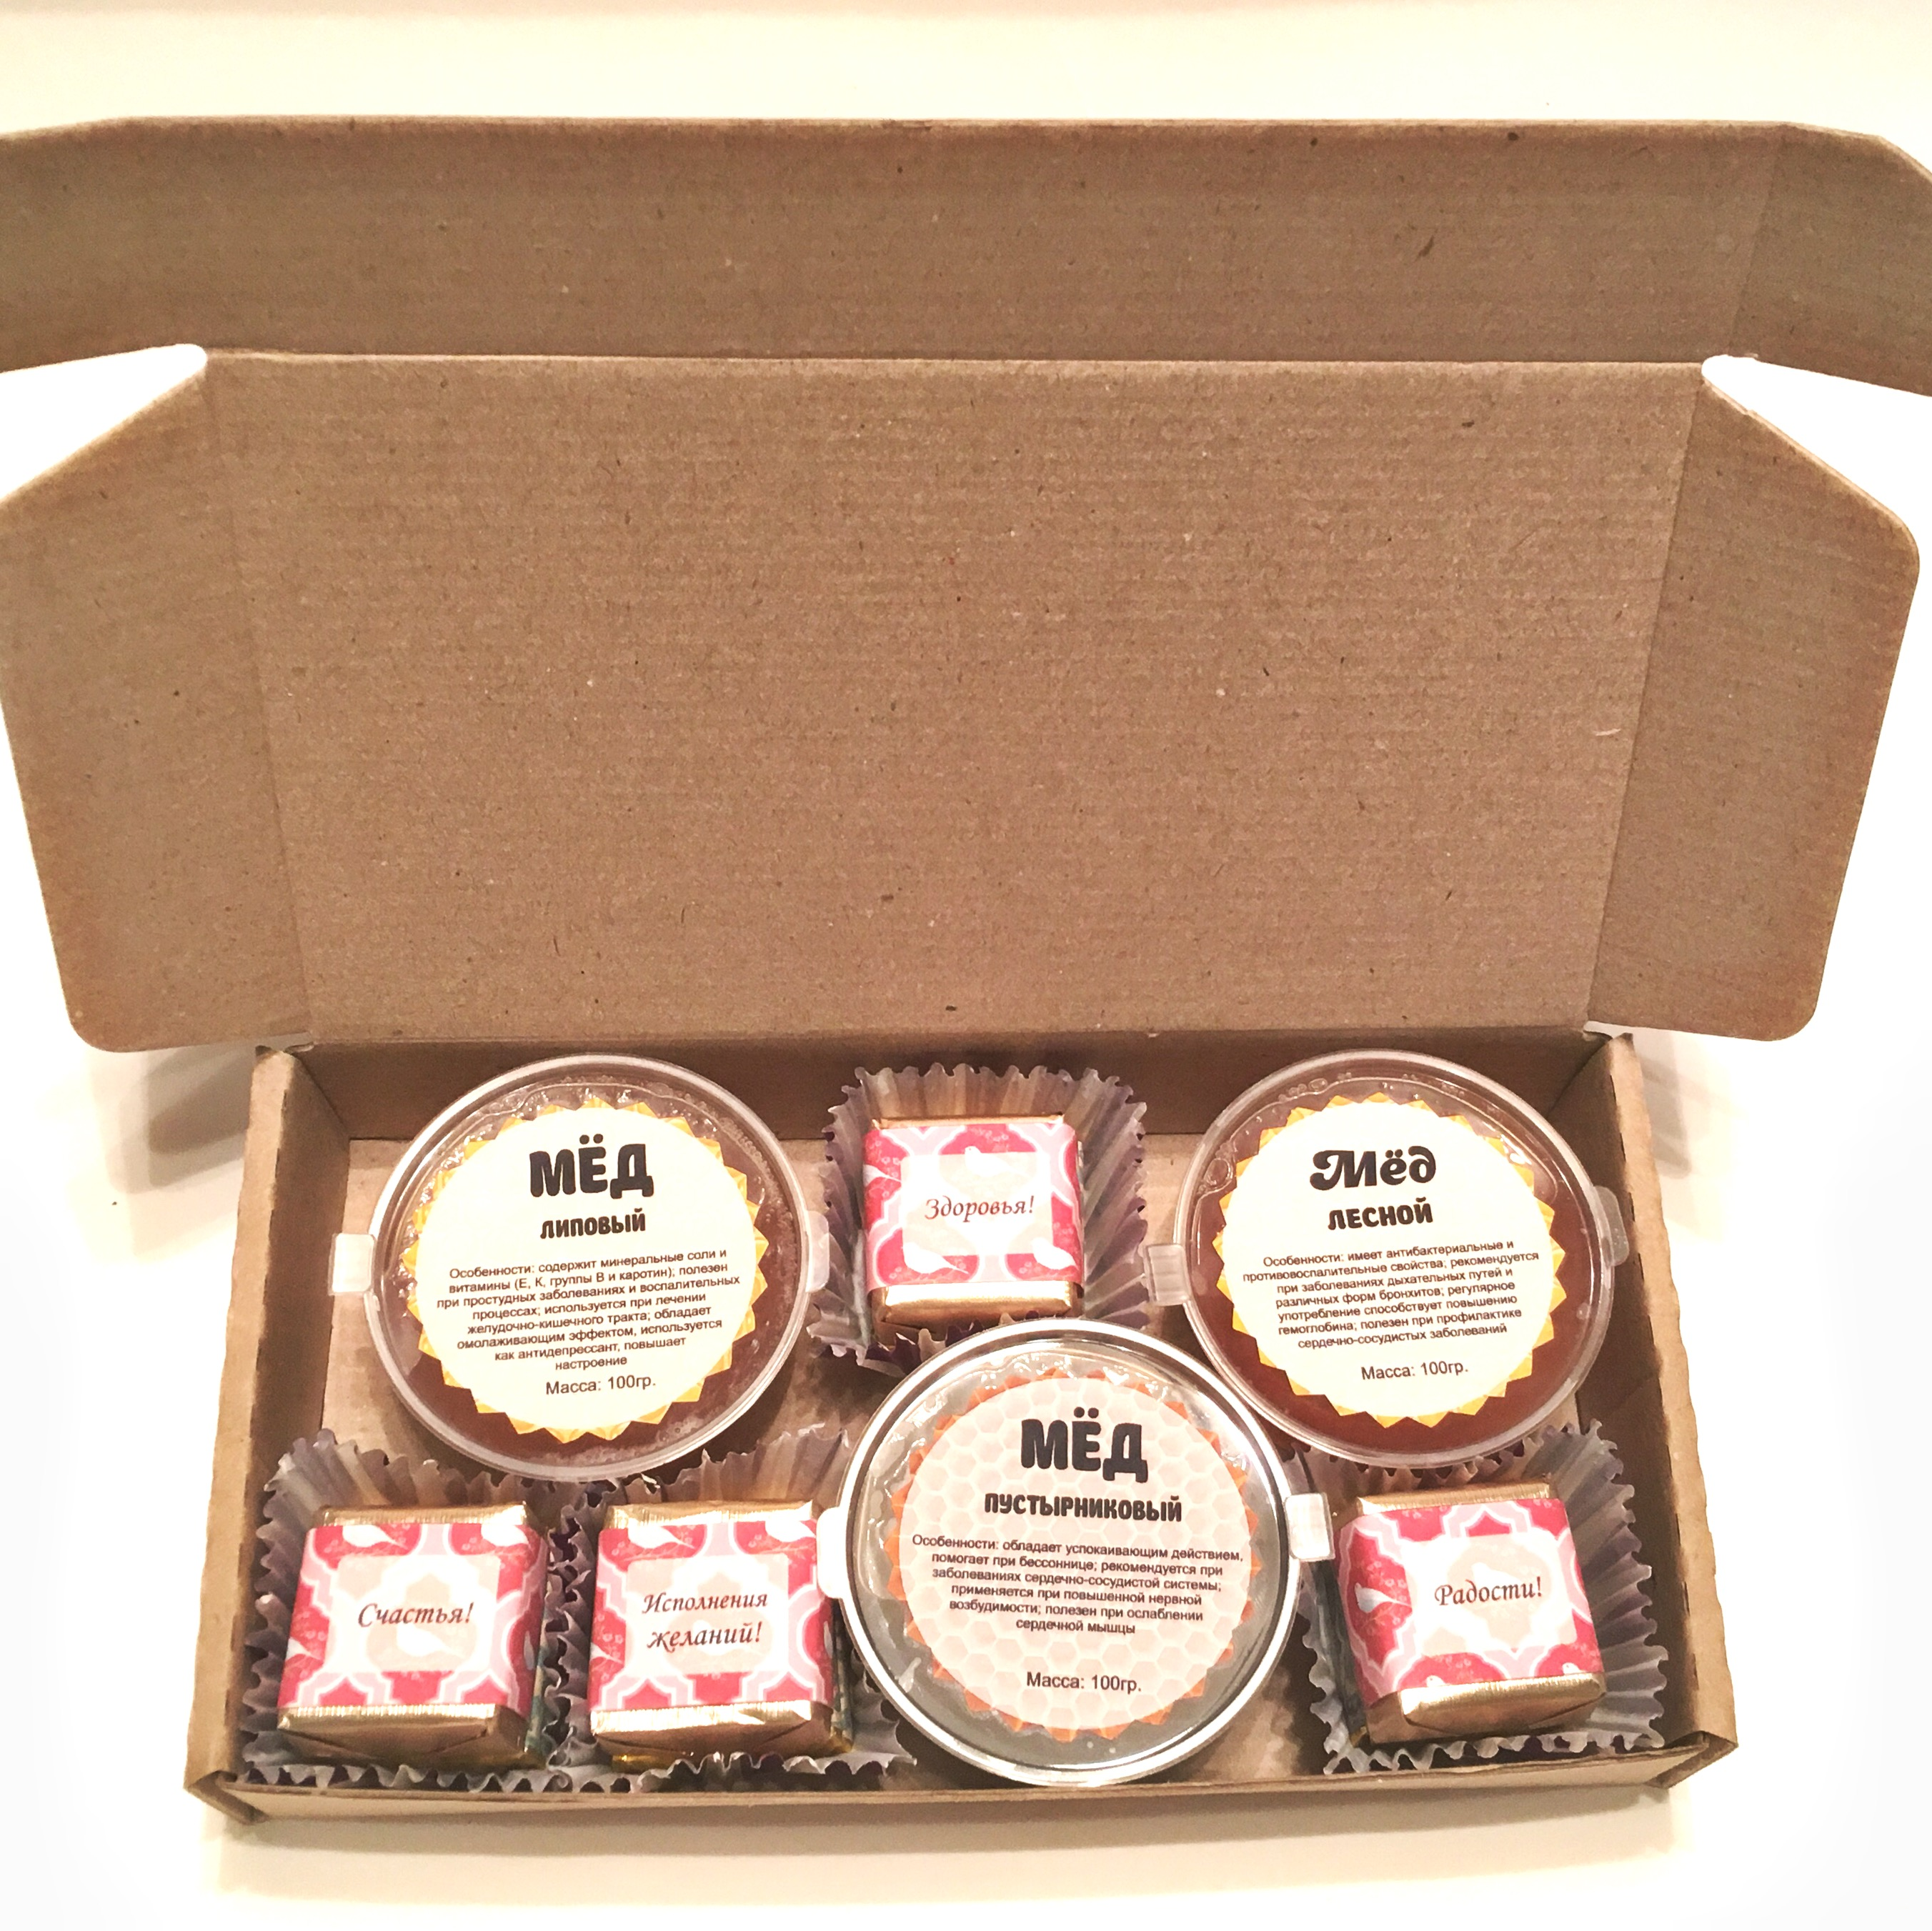 Набор №15. Состав: конфеты (16 шт.) + мед (80 мл. 3шт.)